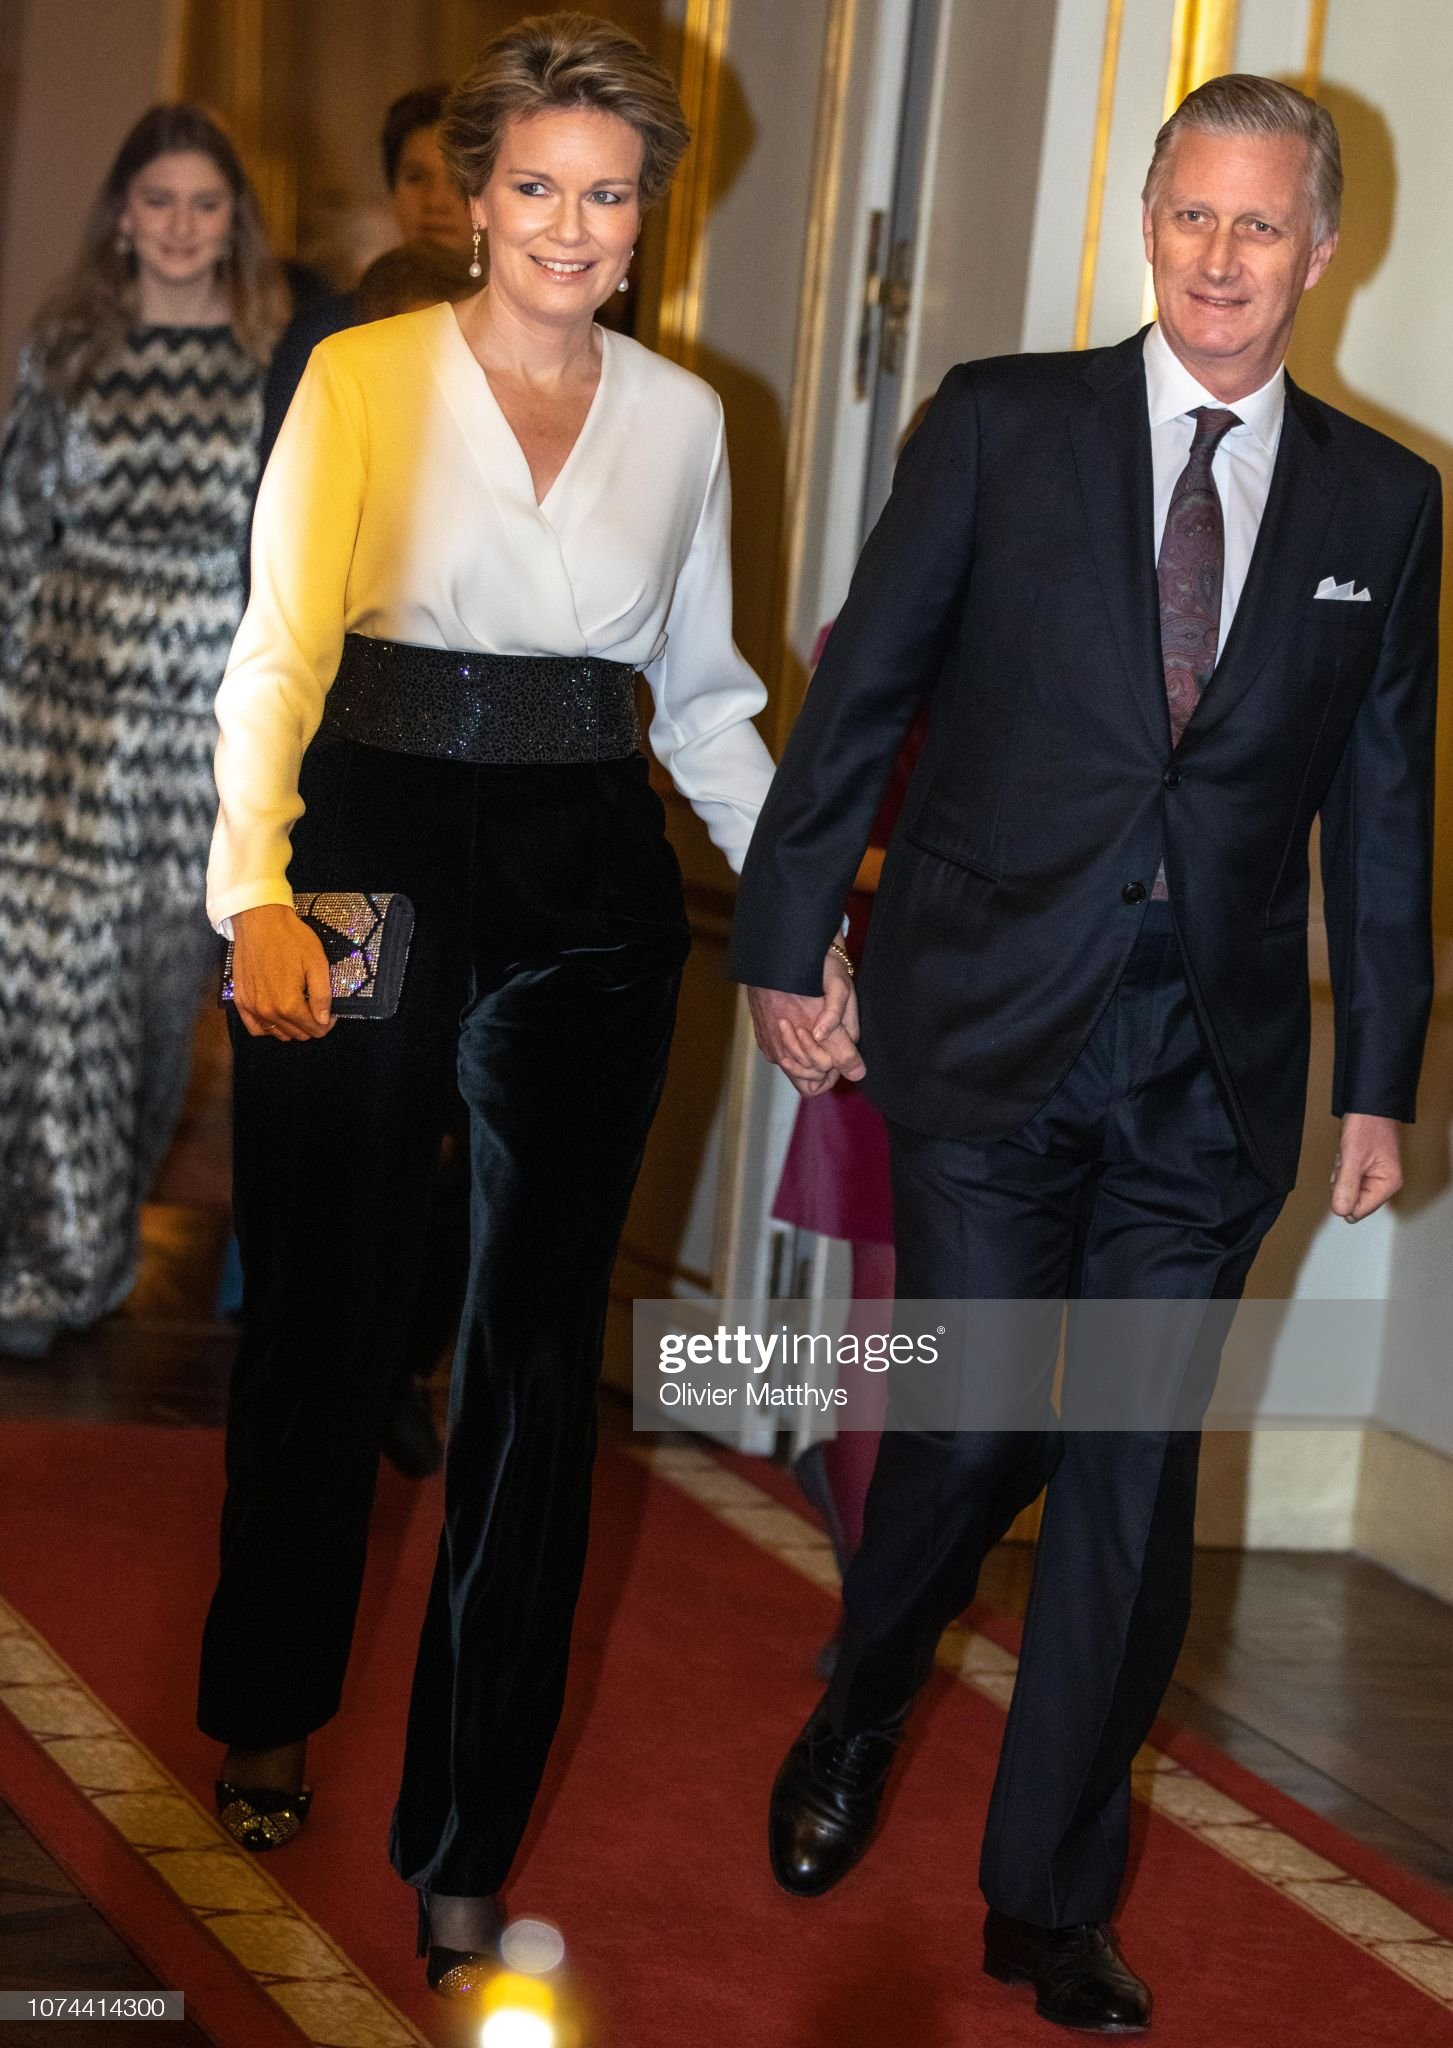 Вечерние наряды Королевы Матильды Belgian Royal Family Attends Christmas Concert In Royal Palace : News Photo